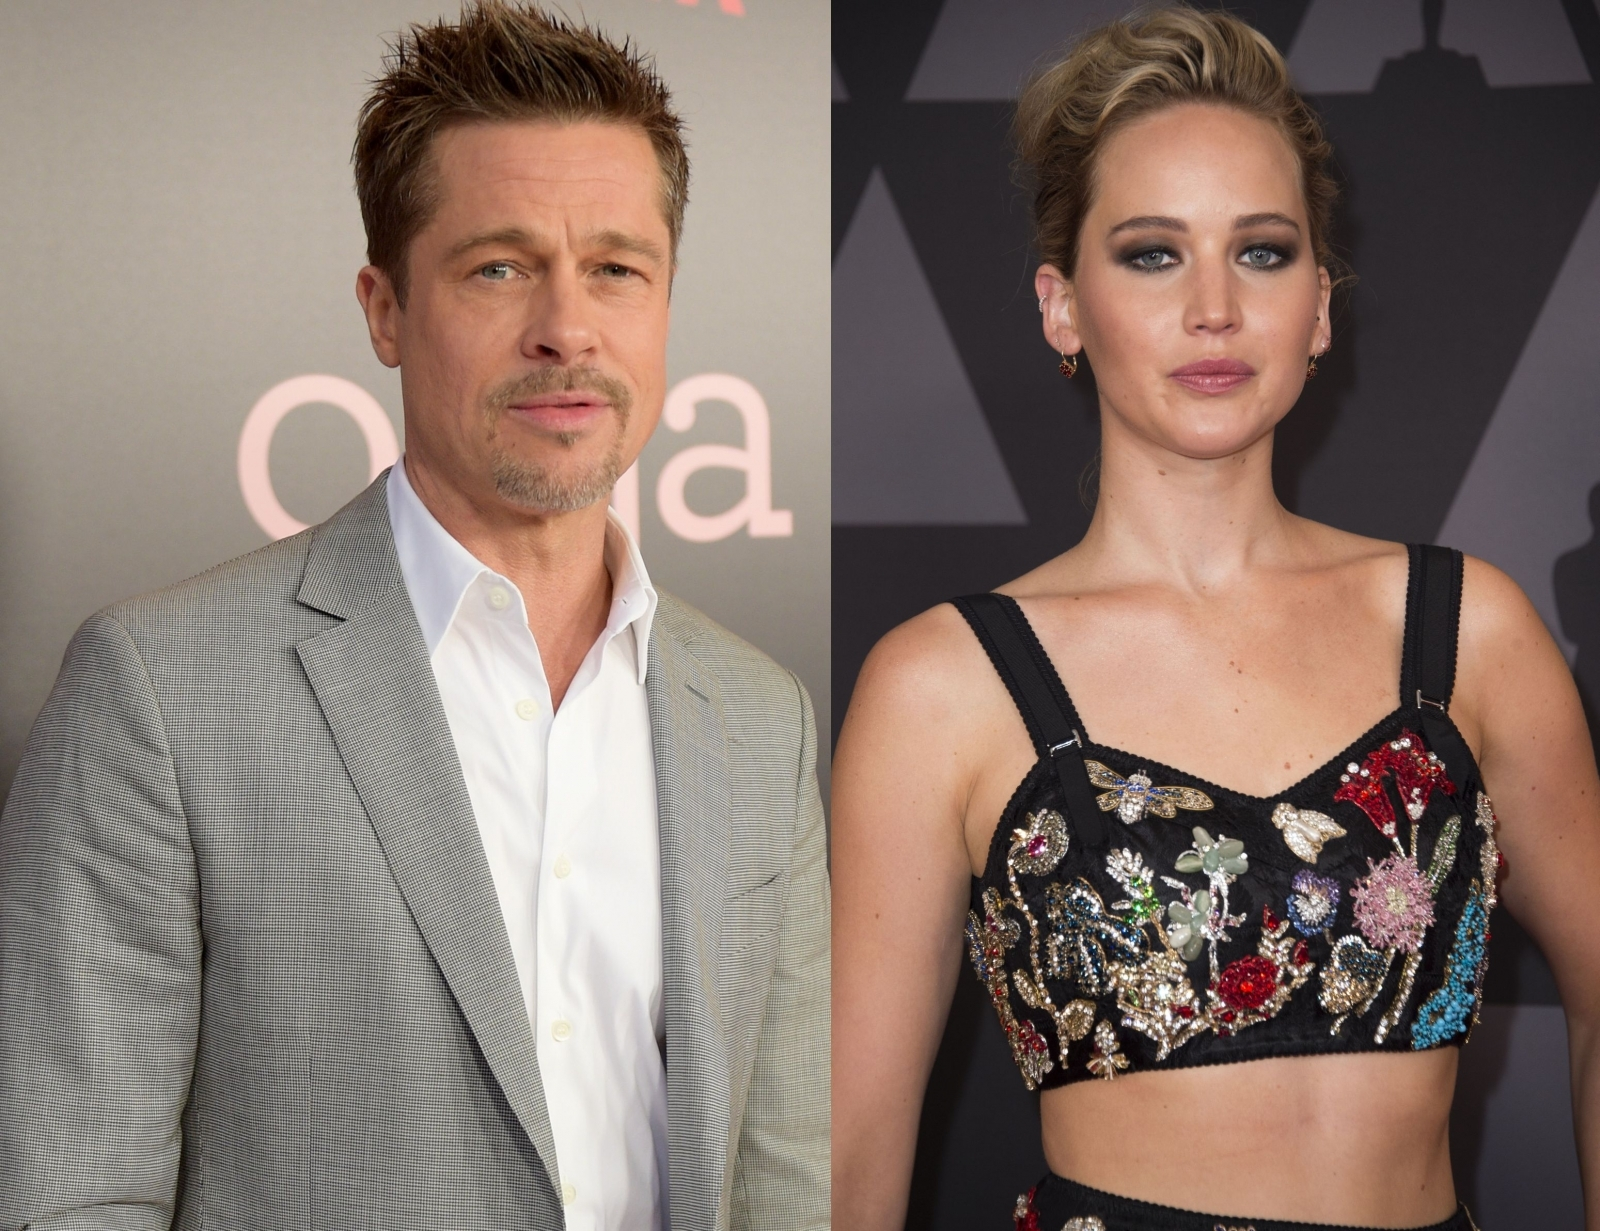 Brad Pitt and Jennifer Lawrence